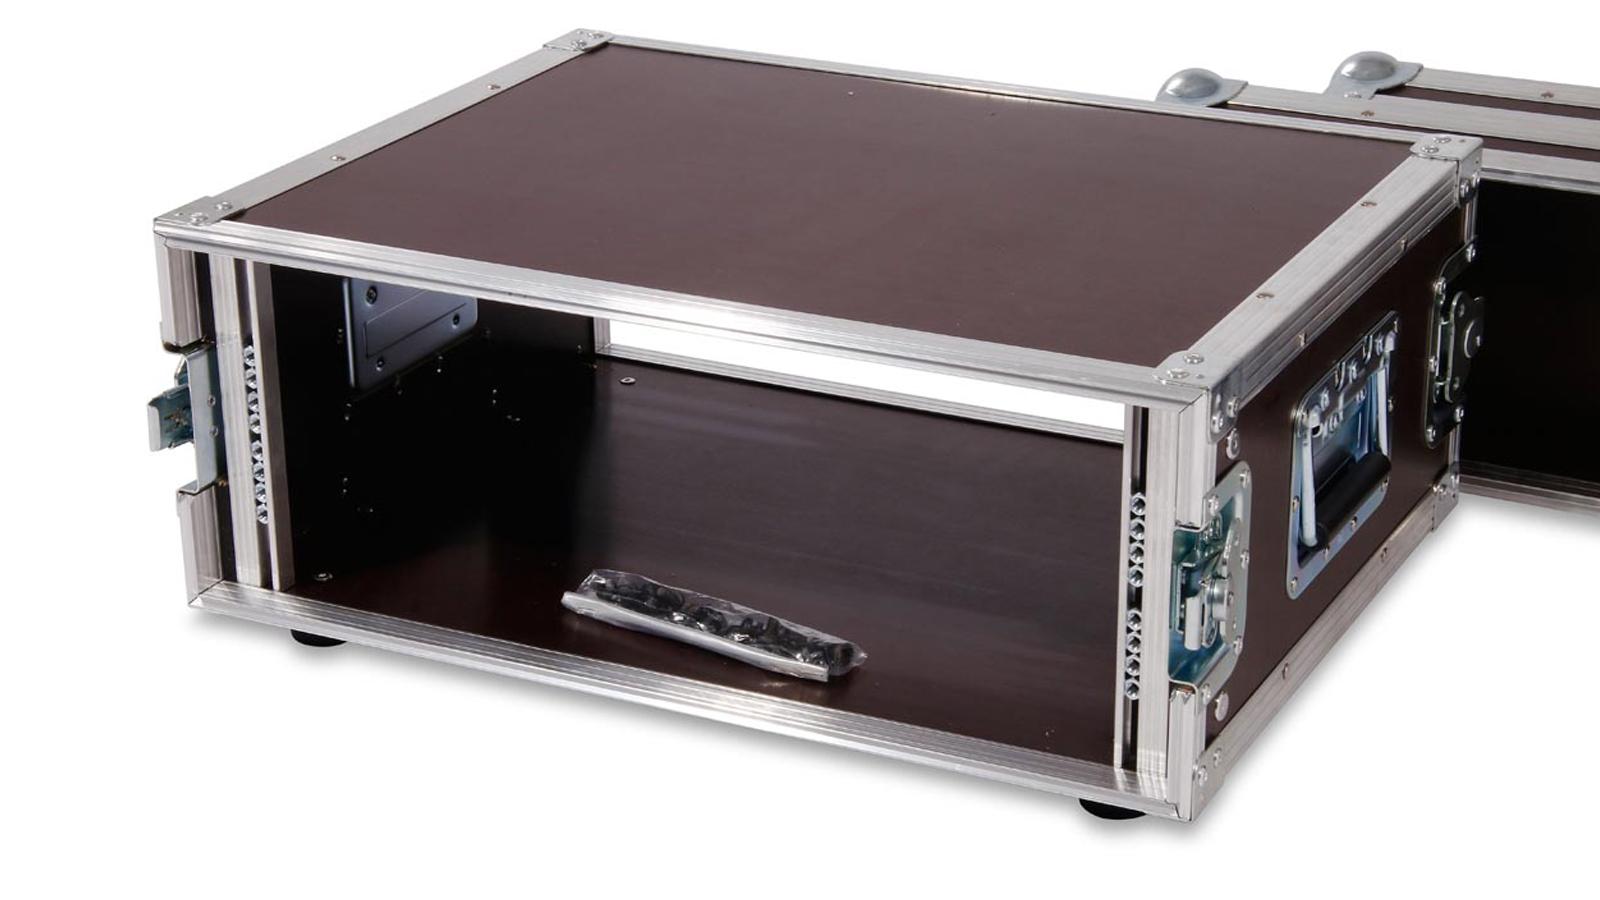 LT-Case 4 HE Live Rack 40 cm